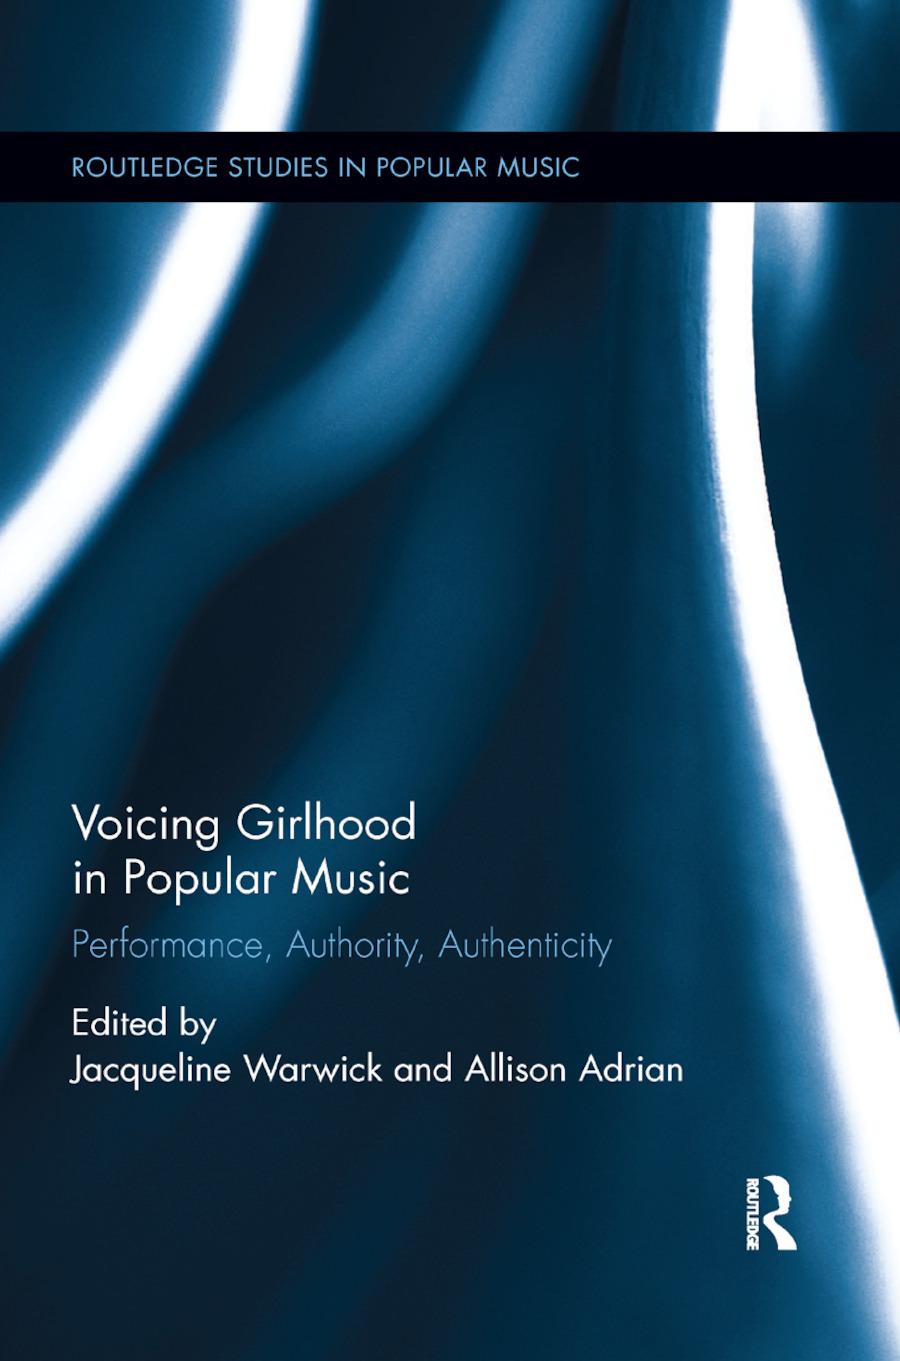 Voicing Girlhood in Popular Music